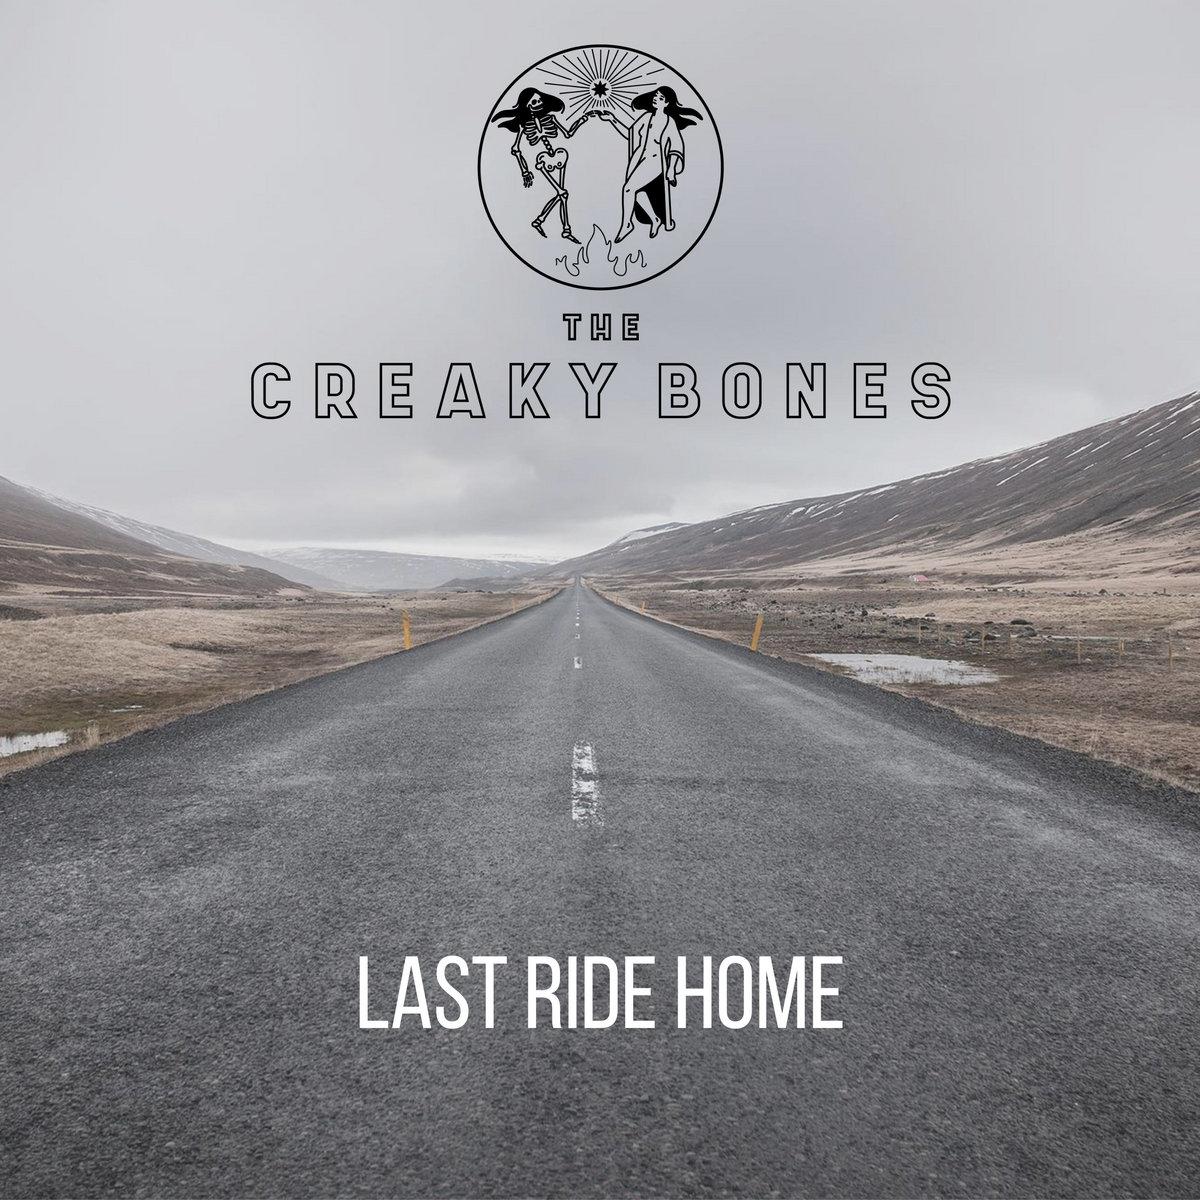 Last Ride Home by The Creaky Bones